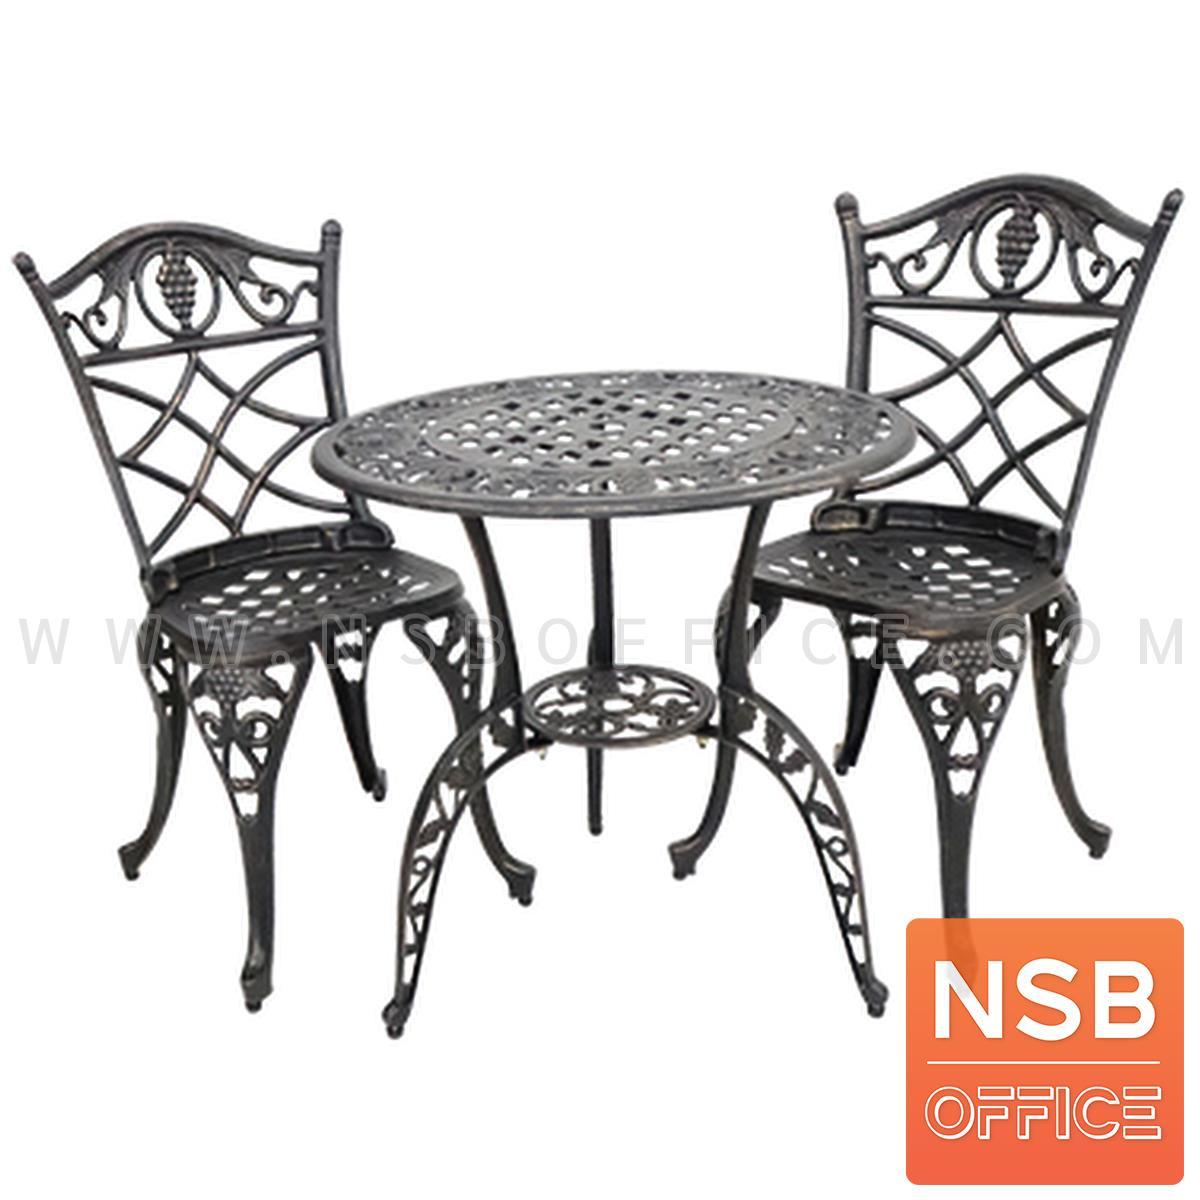 G08A316:ชุดโต๊ะและเก้าอี้เหล็กหล่อ รุ่น Carly (คาร์ลี่) 2 ที่นั่ง พร้อมโต๊ะกลาง